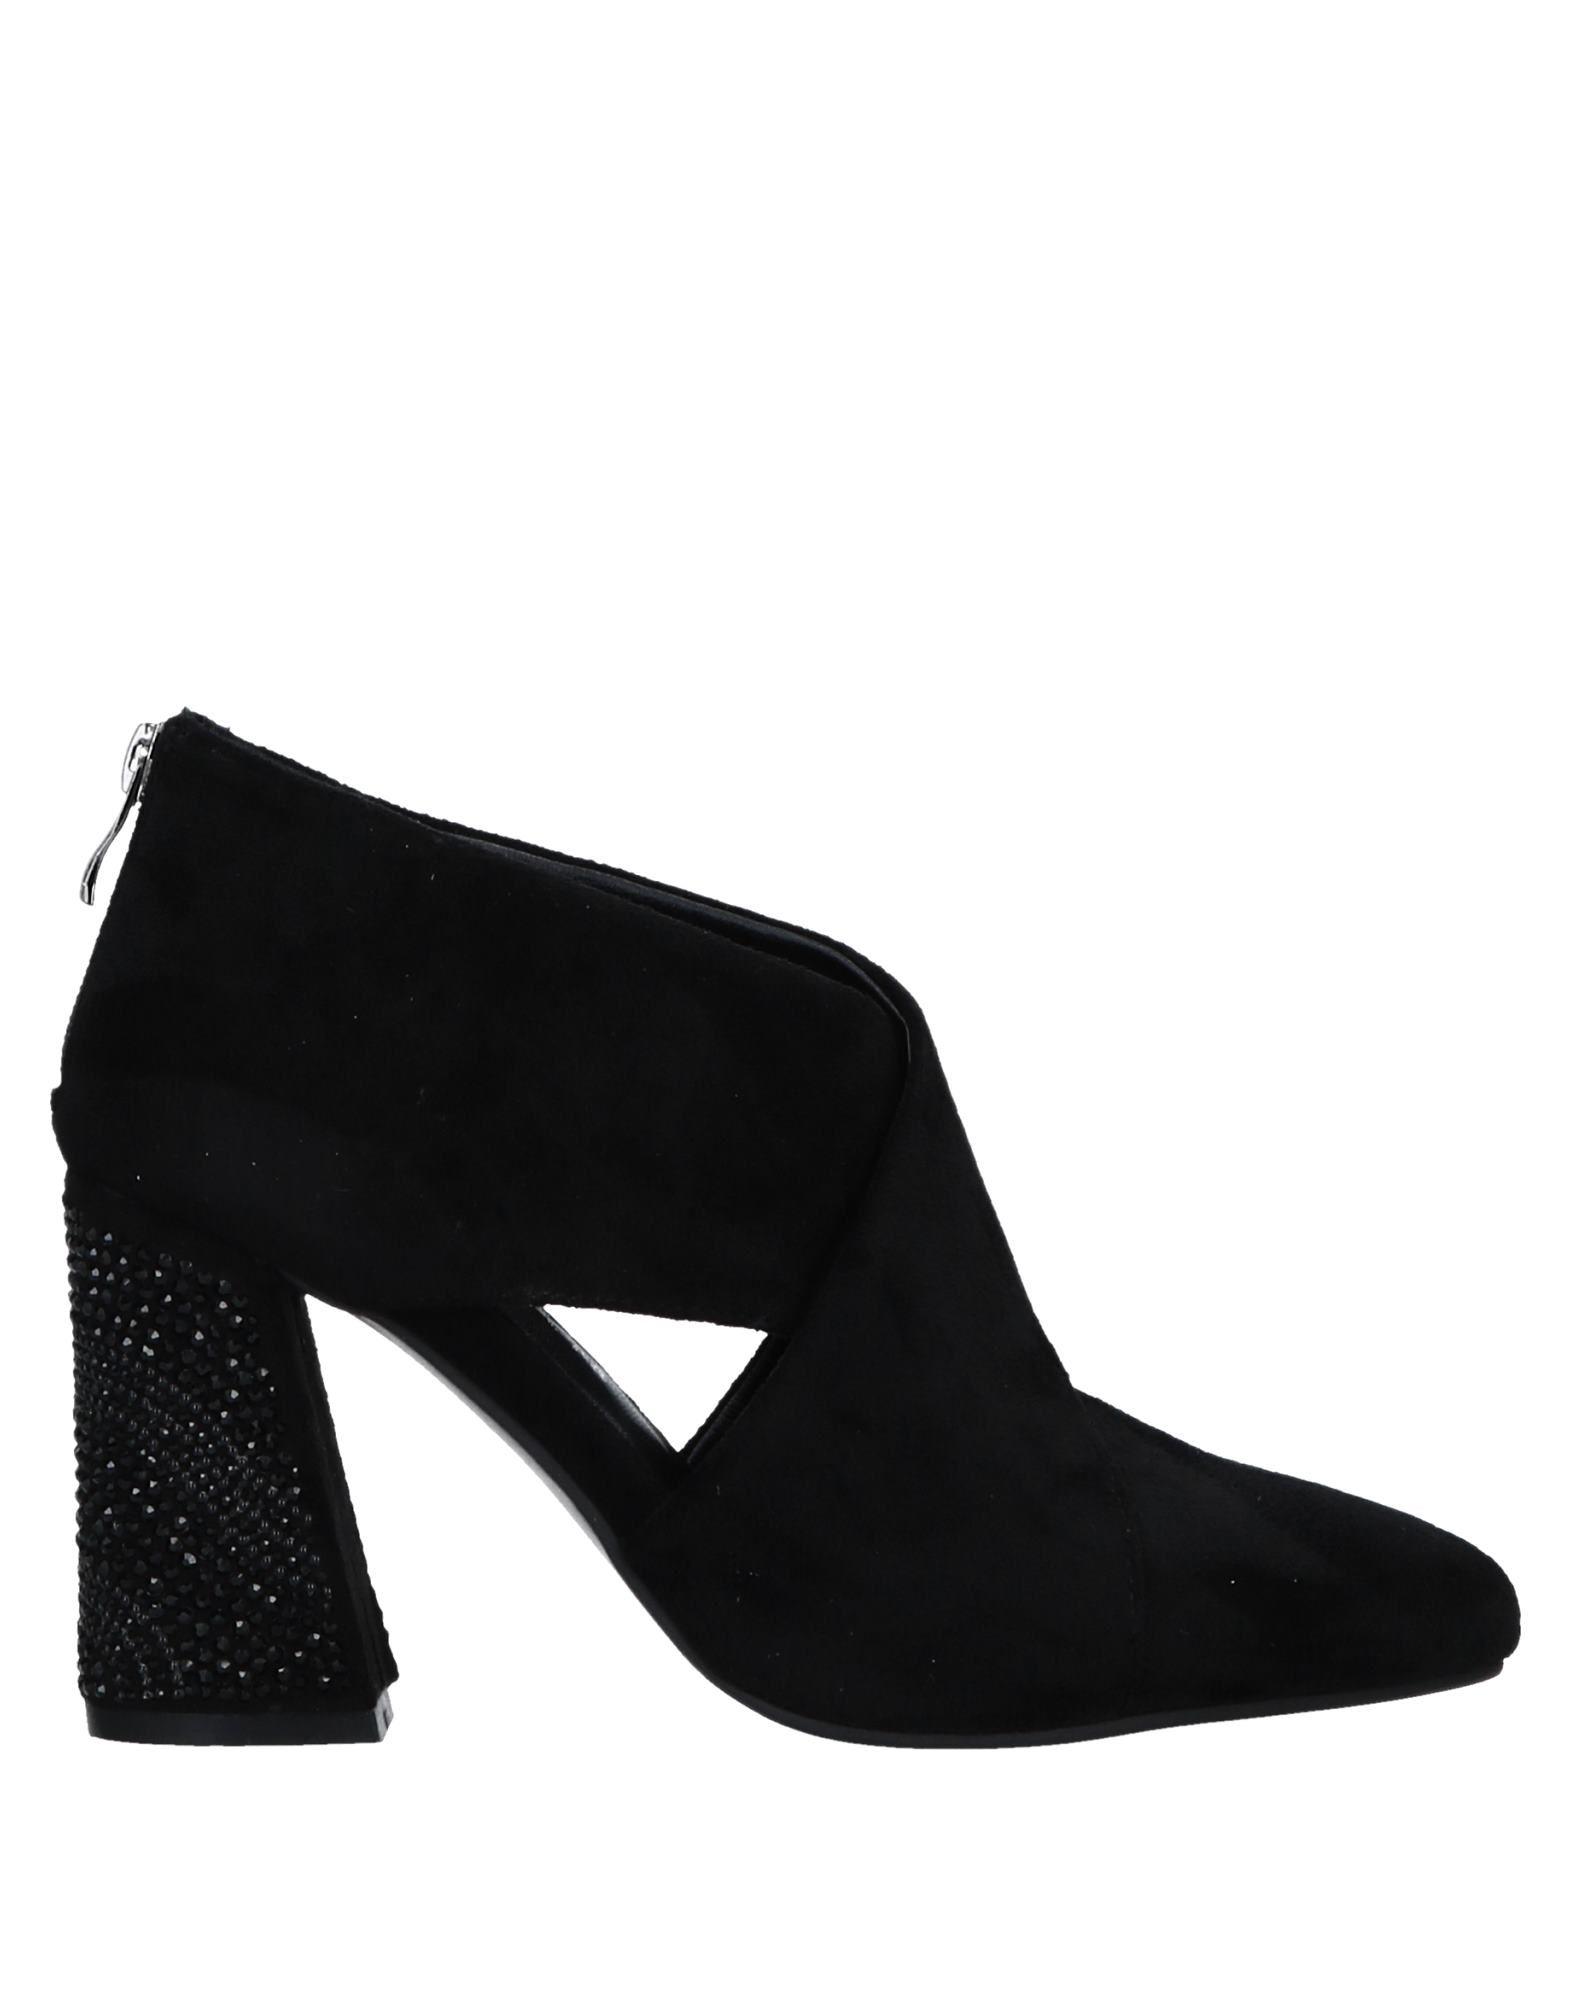 Alma En Pena. Stiefelette Damen  11525563KX Gute Qualität beliebte Schuhe